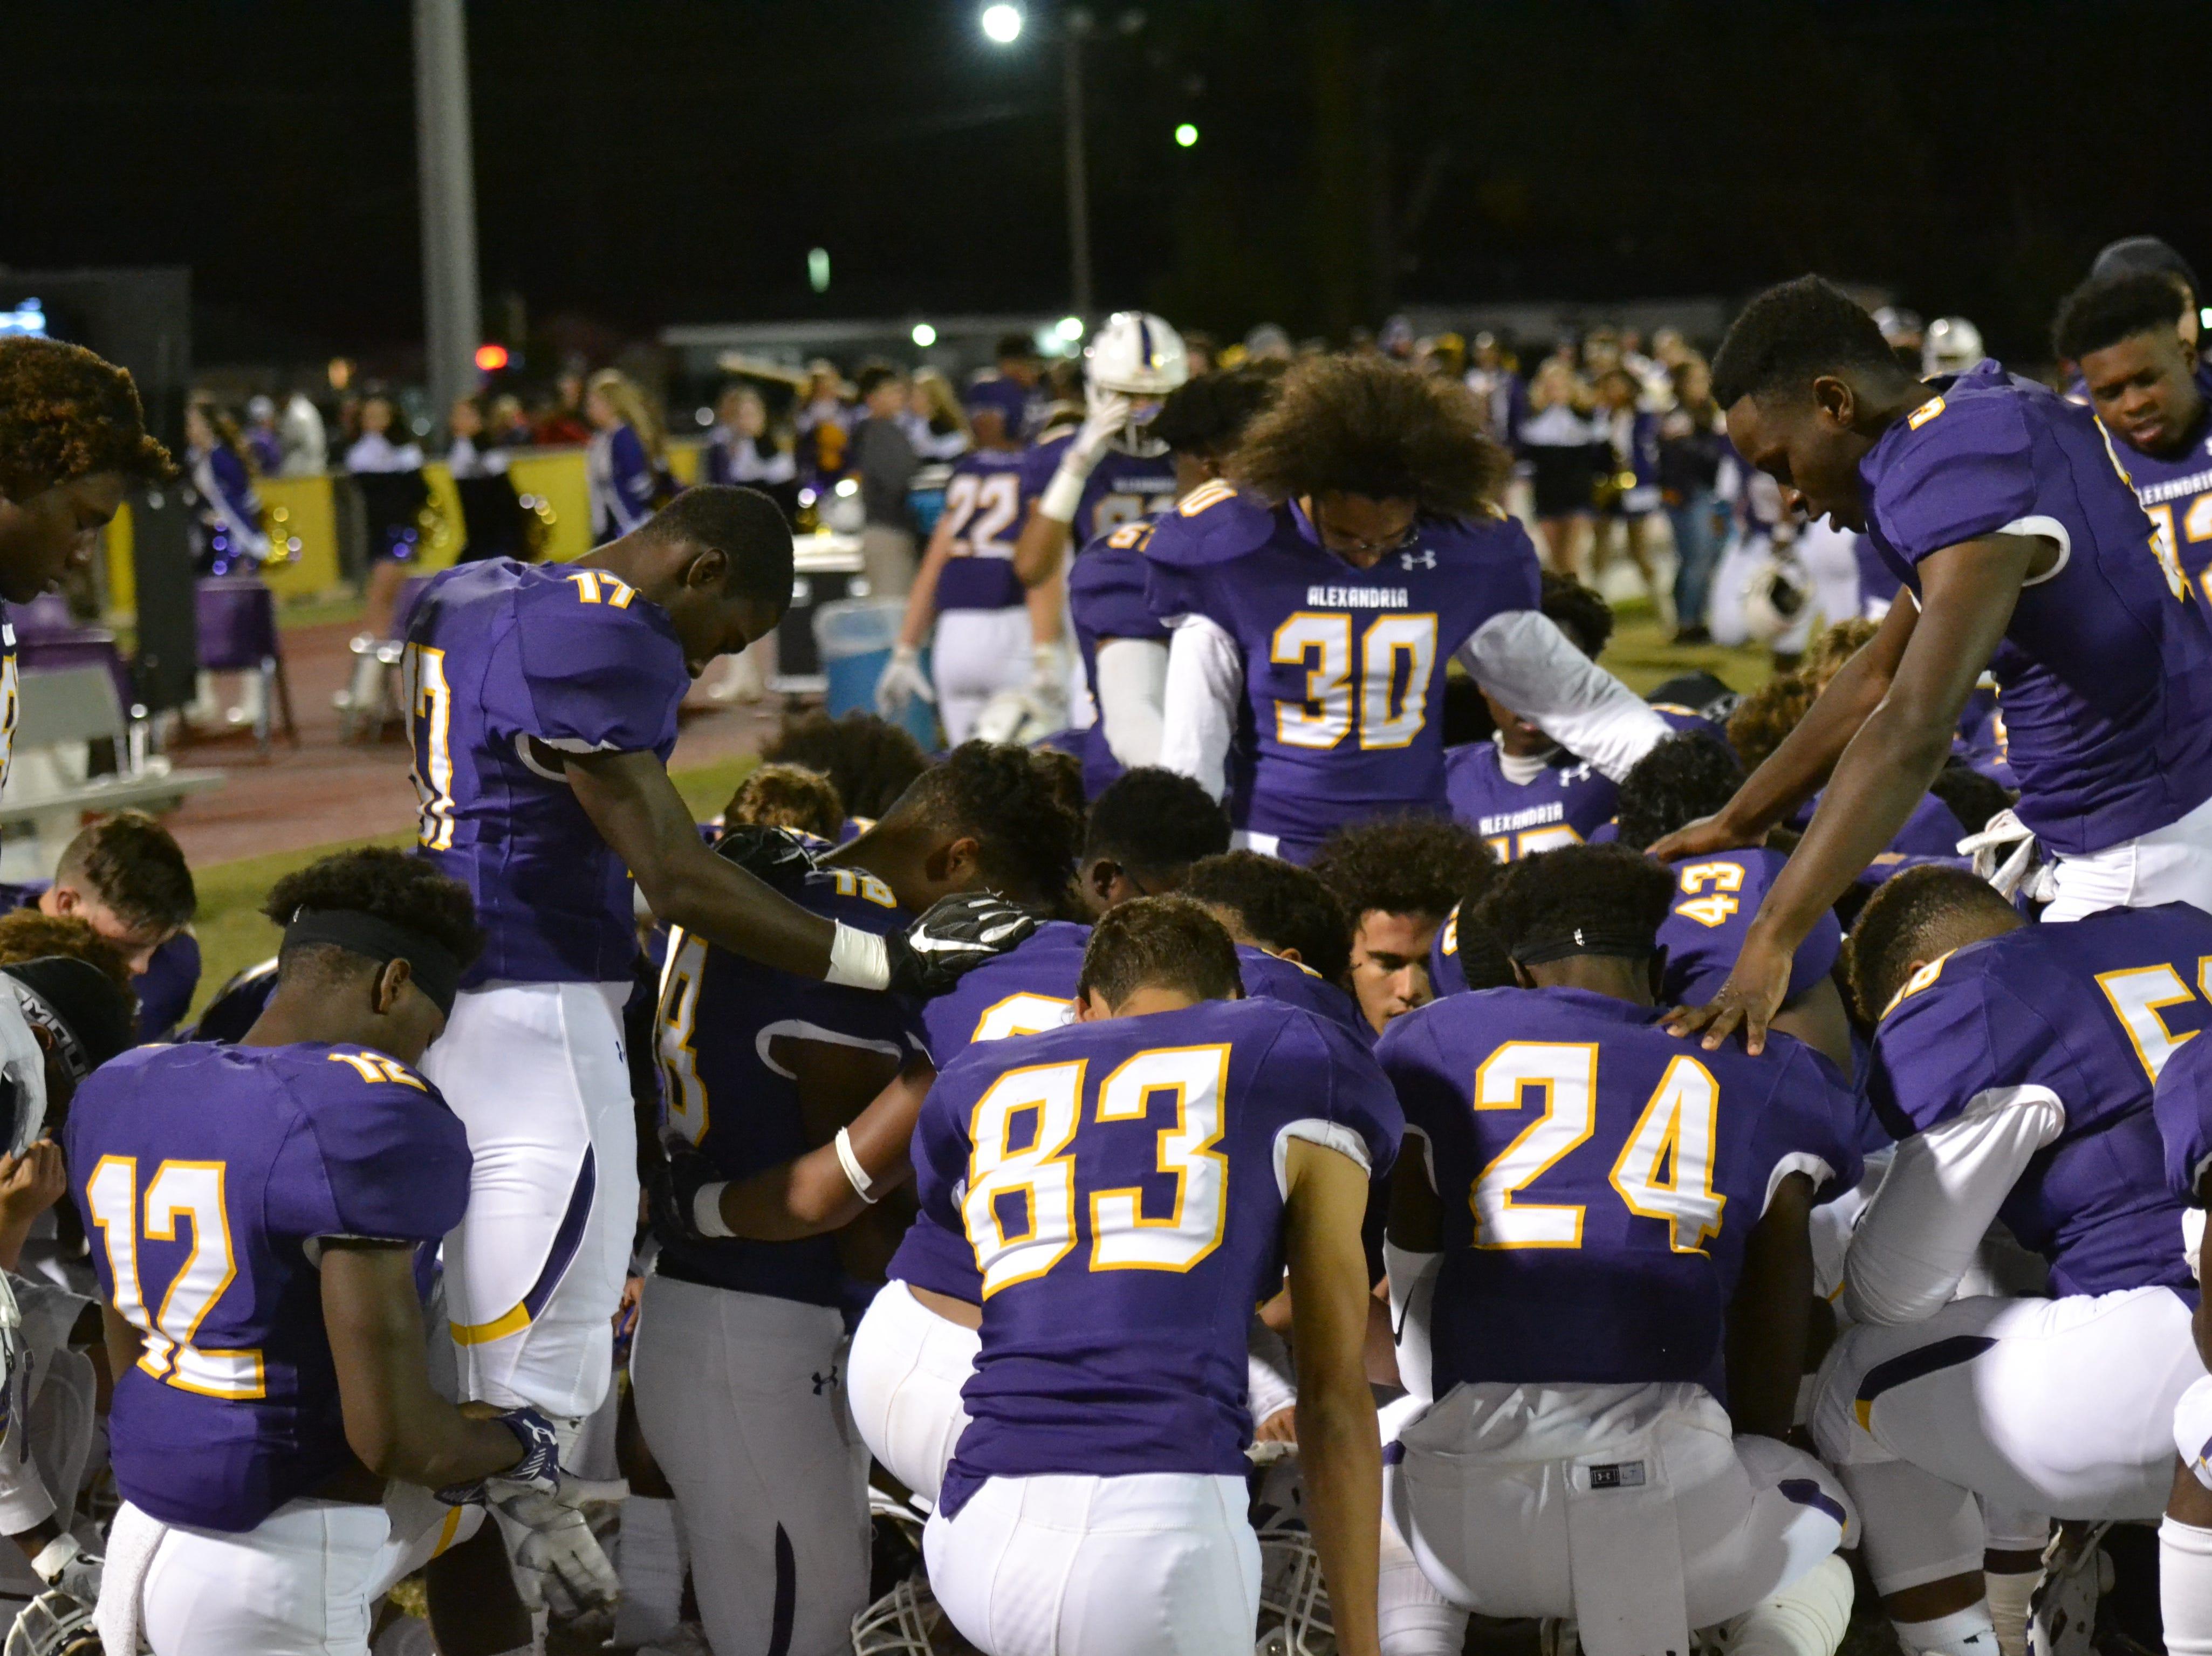 ASH players gather in prayer before the game. The ASH Trojans fell to the Ouachita Parish Lions 42-20 Thursday, Nov. 1, at Alexandria Senior High.